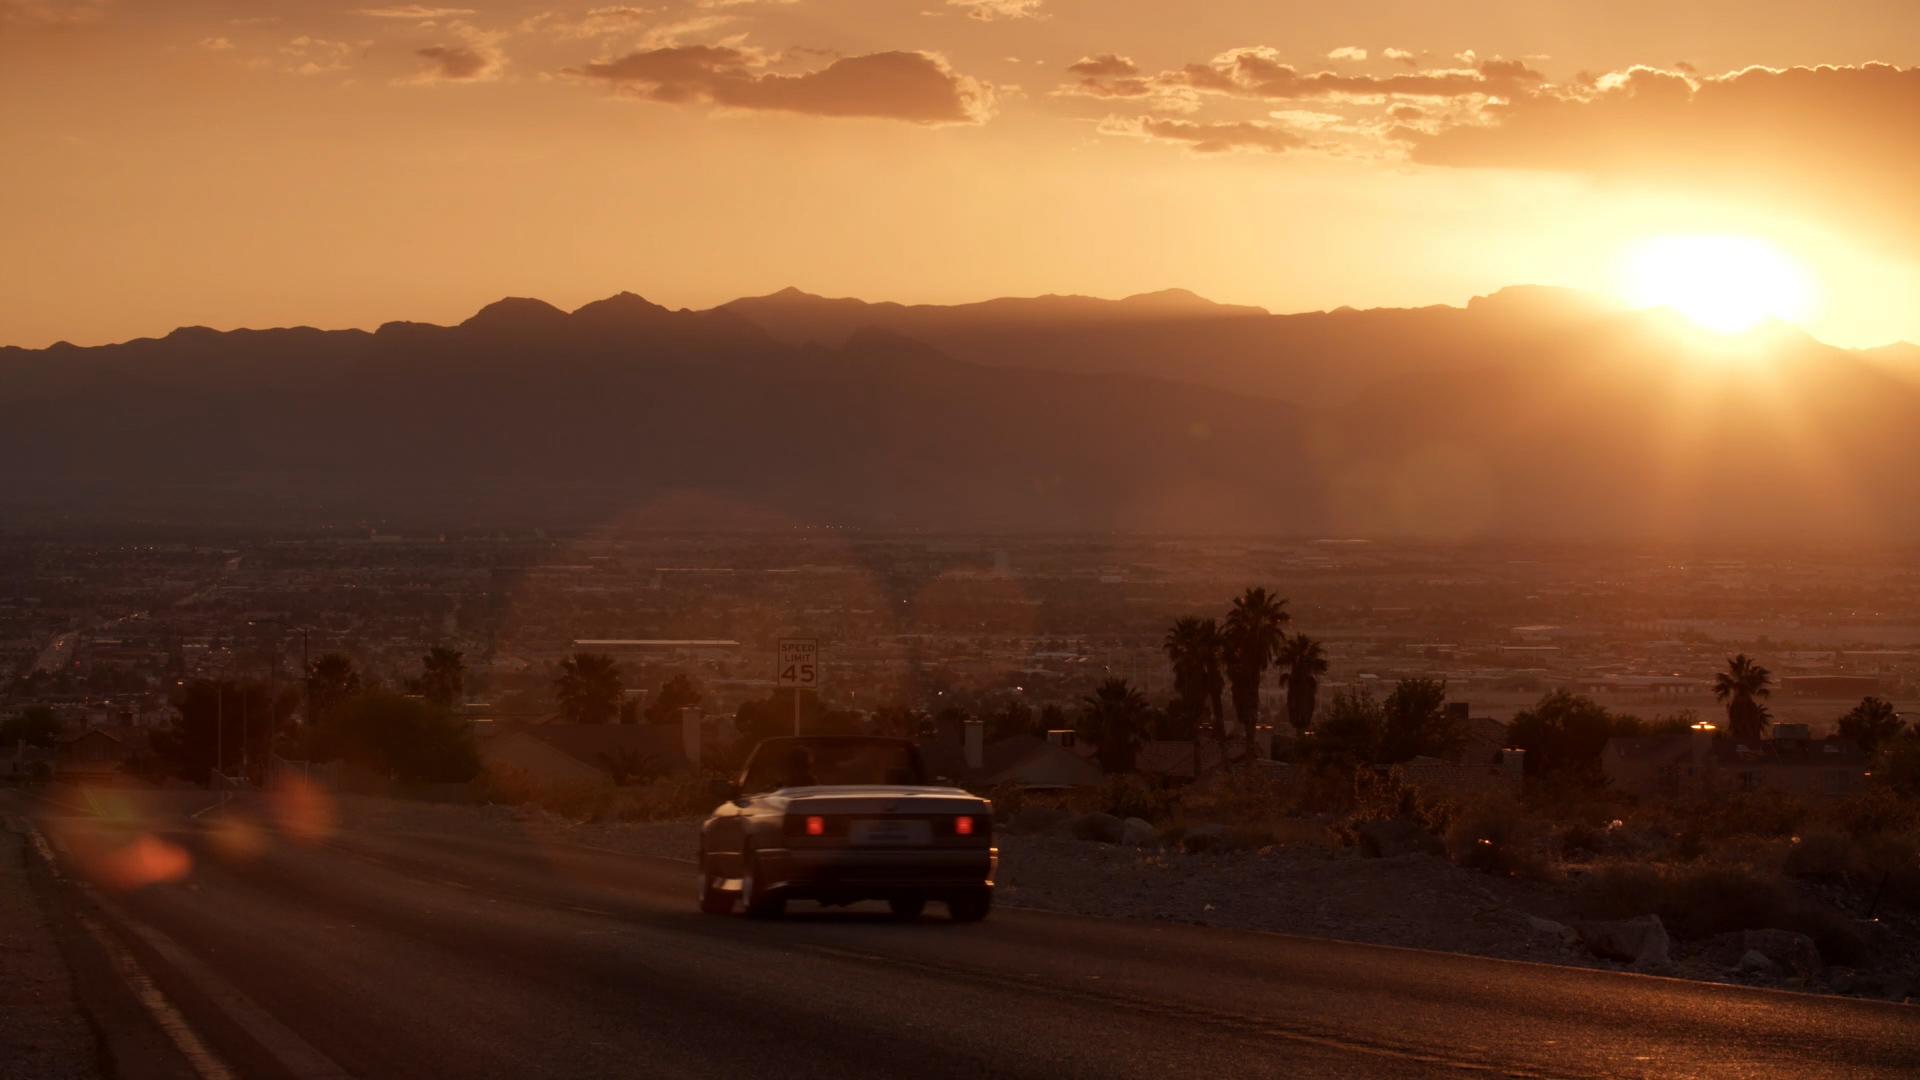 Sunset BMW 3 Series